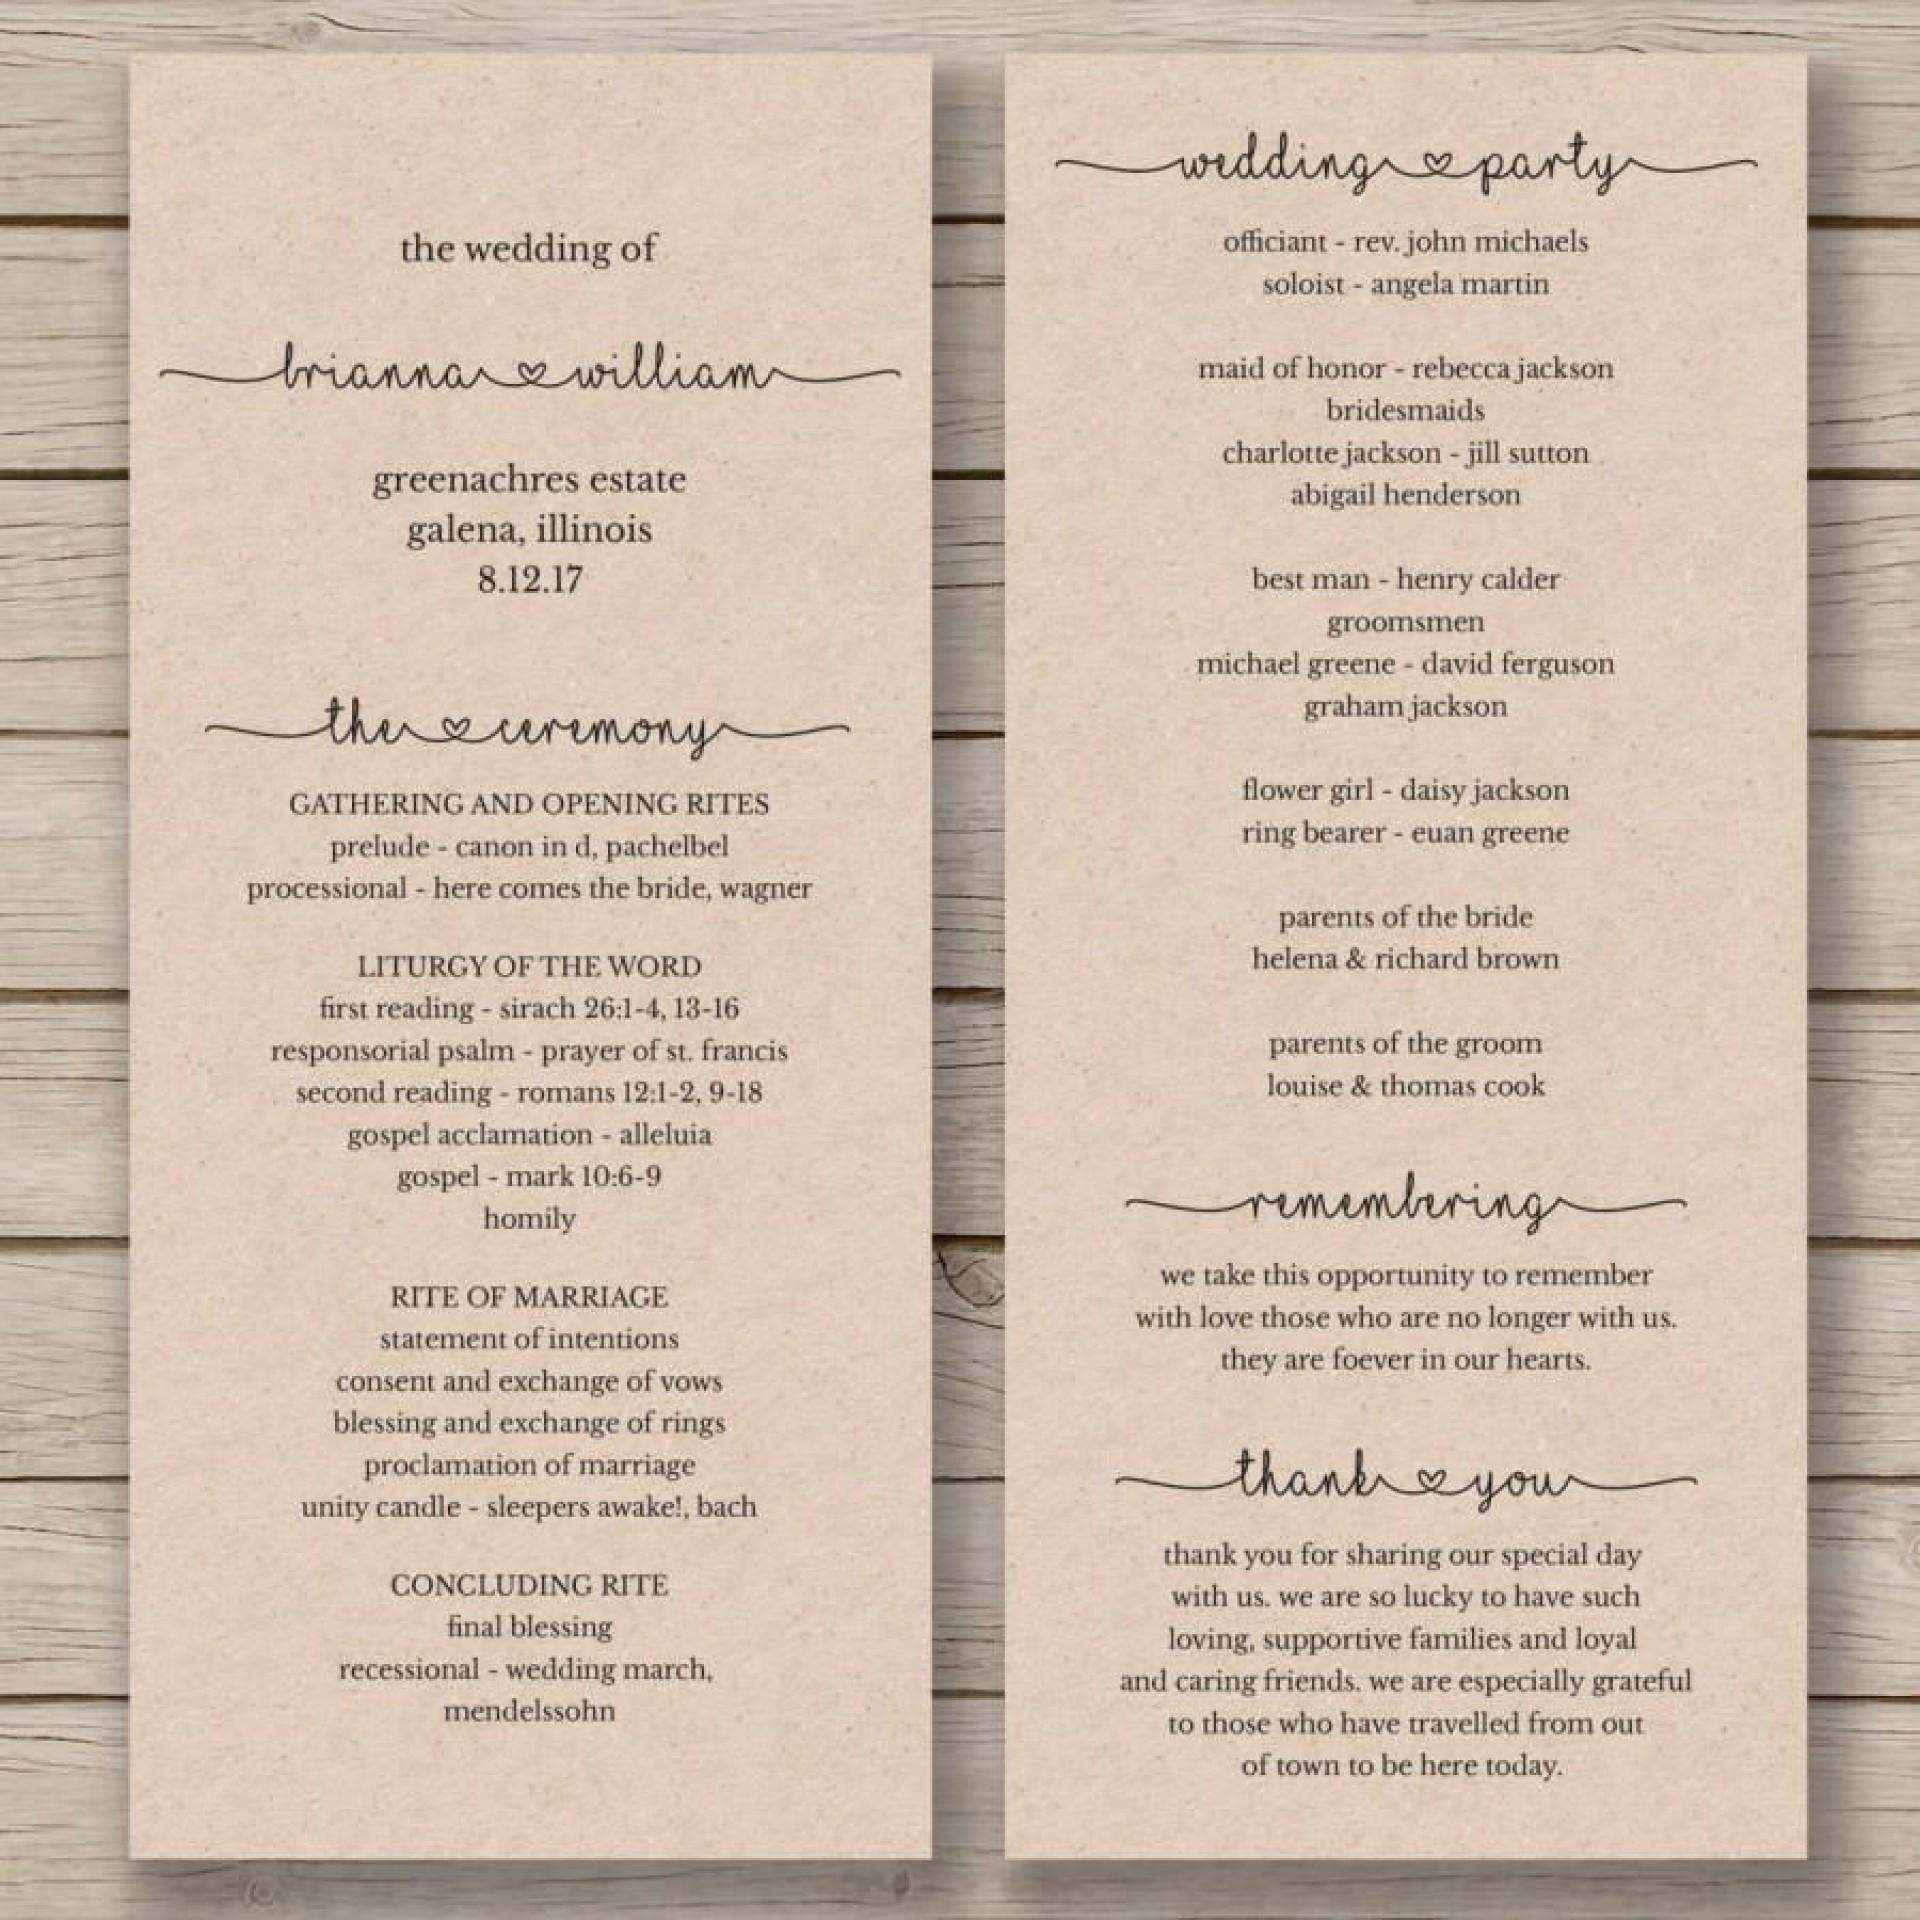 008 Best Wedding Program Template Word High Definition  Catholic Mas Sample Wording Idea Example Simple1920